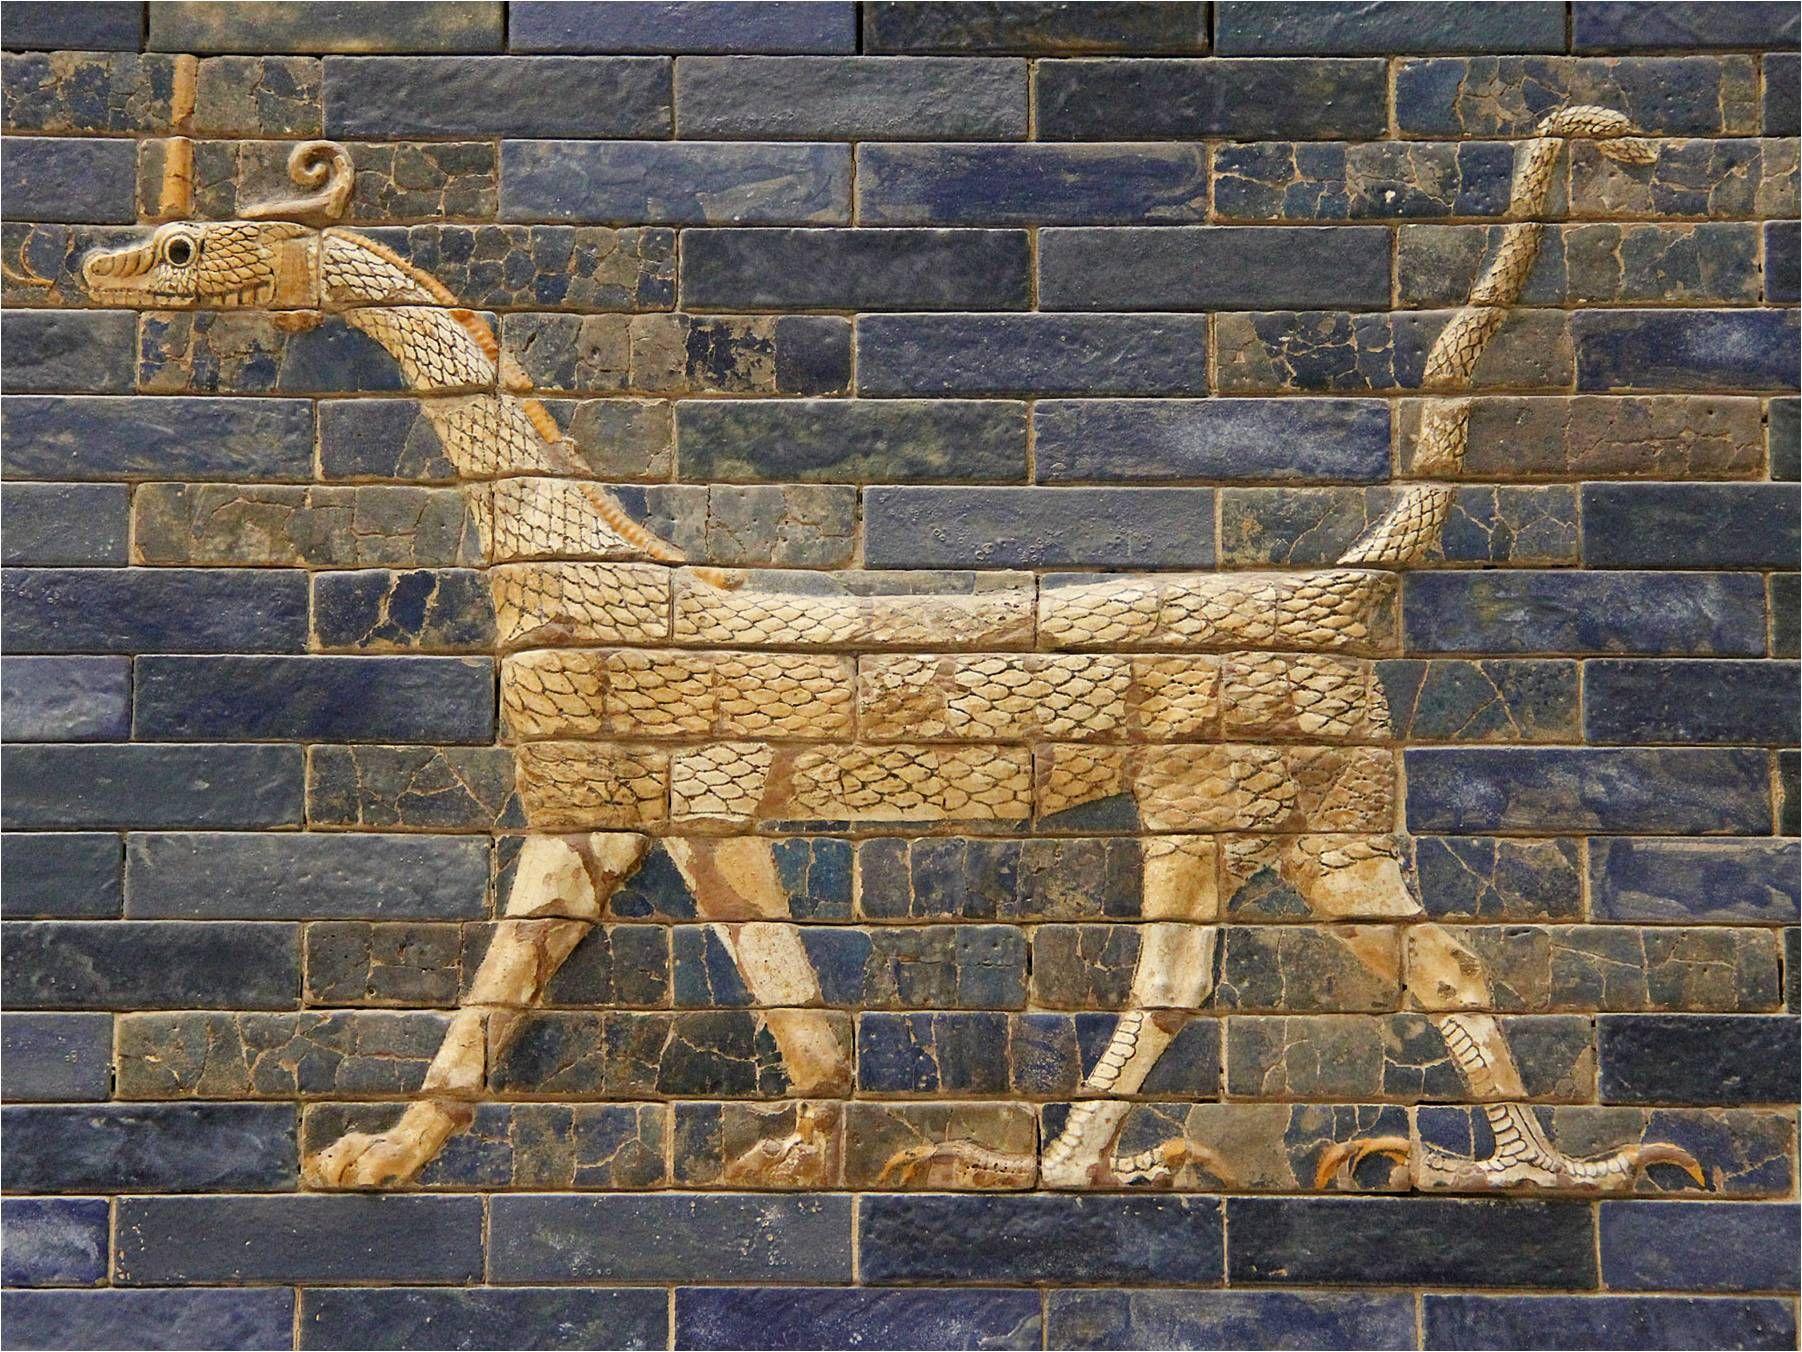 Snake-Dragon, symbol of Marduk, the Patron God of Babylon